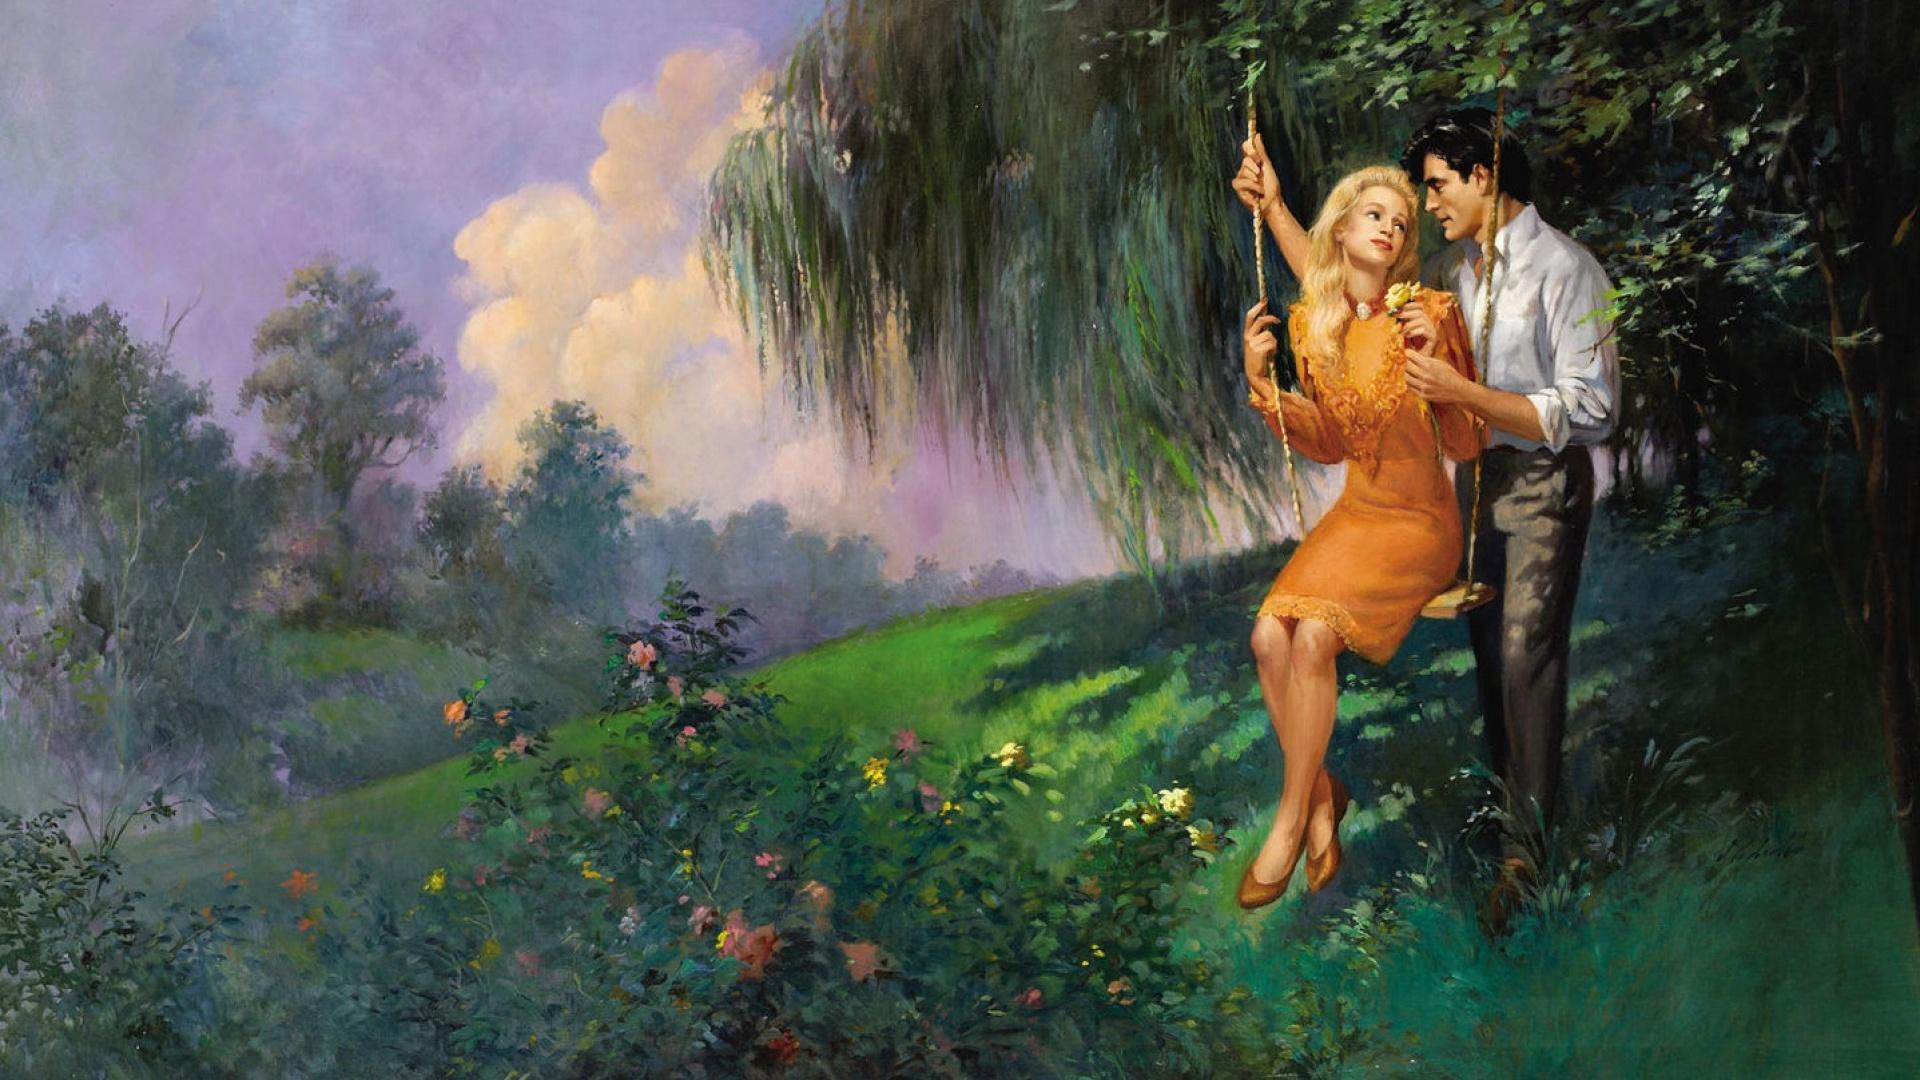 Beautiful Painting Romantic Couple - HD Wallpaper